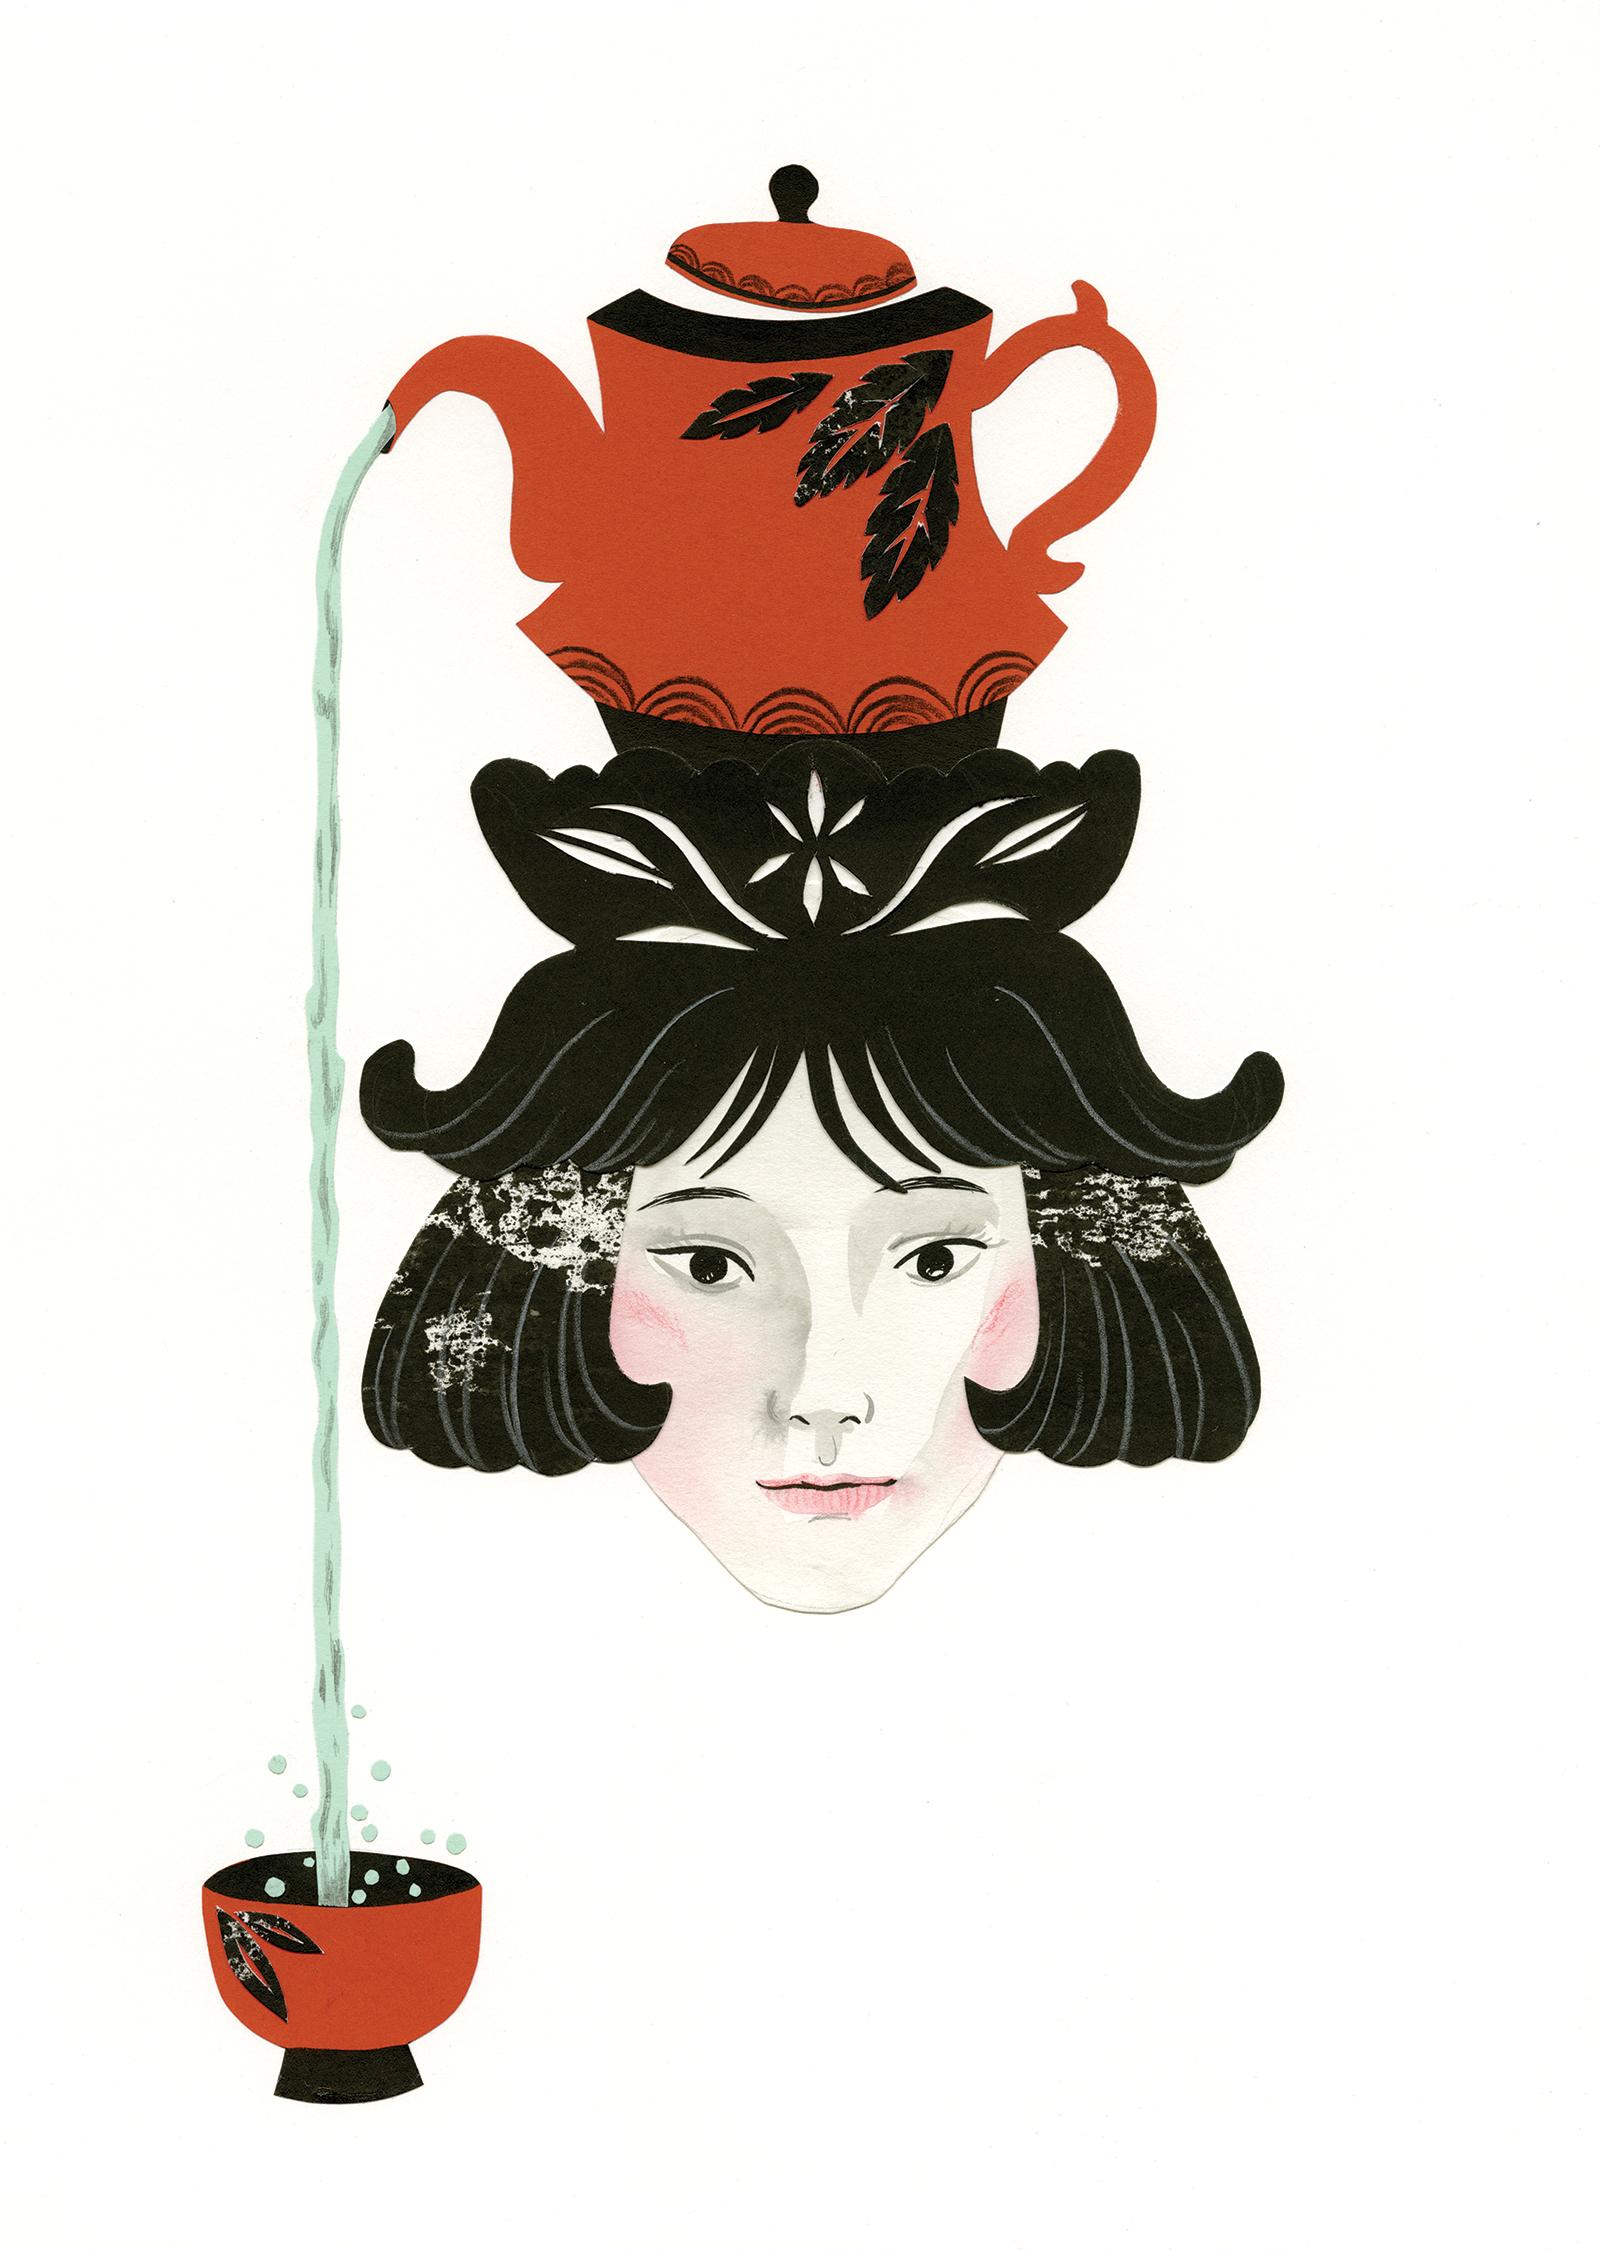 AA 2013 - ARTIST: Hye Jin ChungTITLE: Tea Ceremony Teacher [Series, 1 of 3]